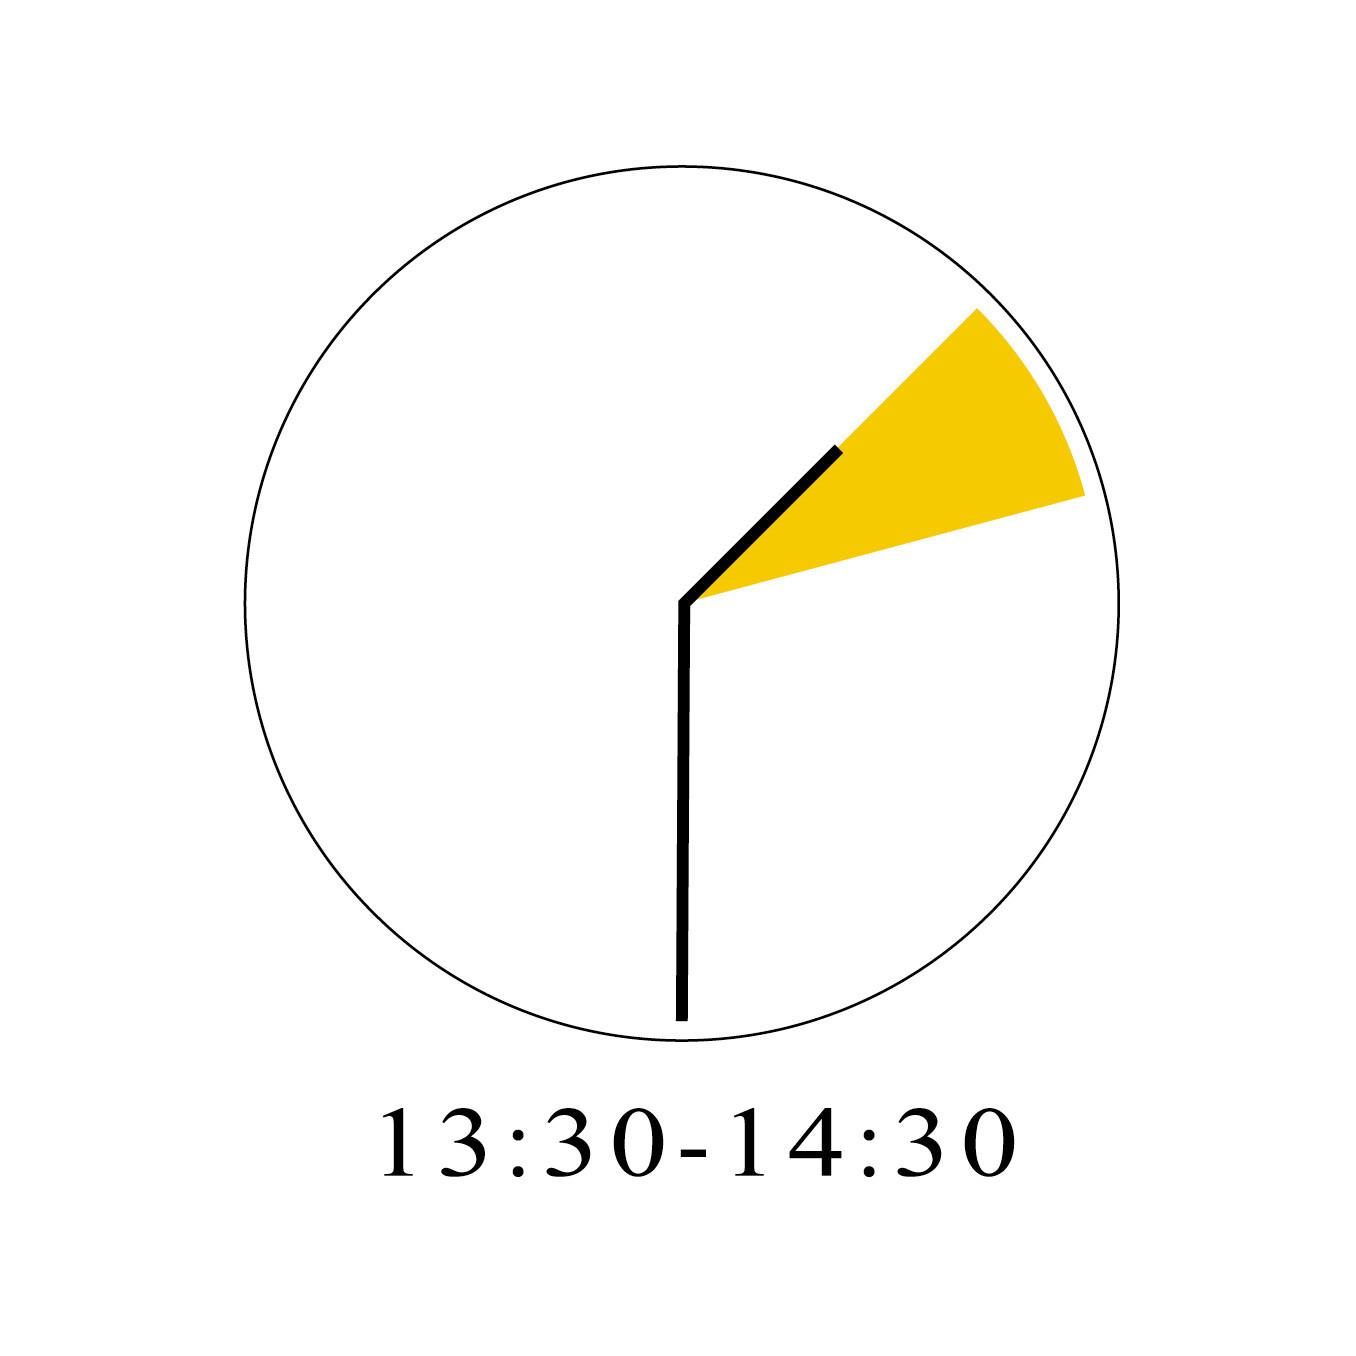 3/15 13:30-14:30